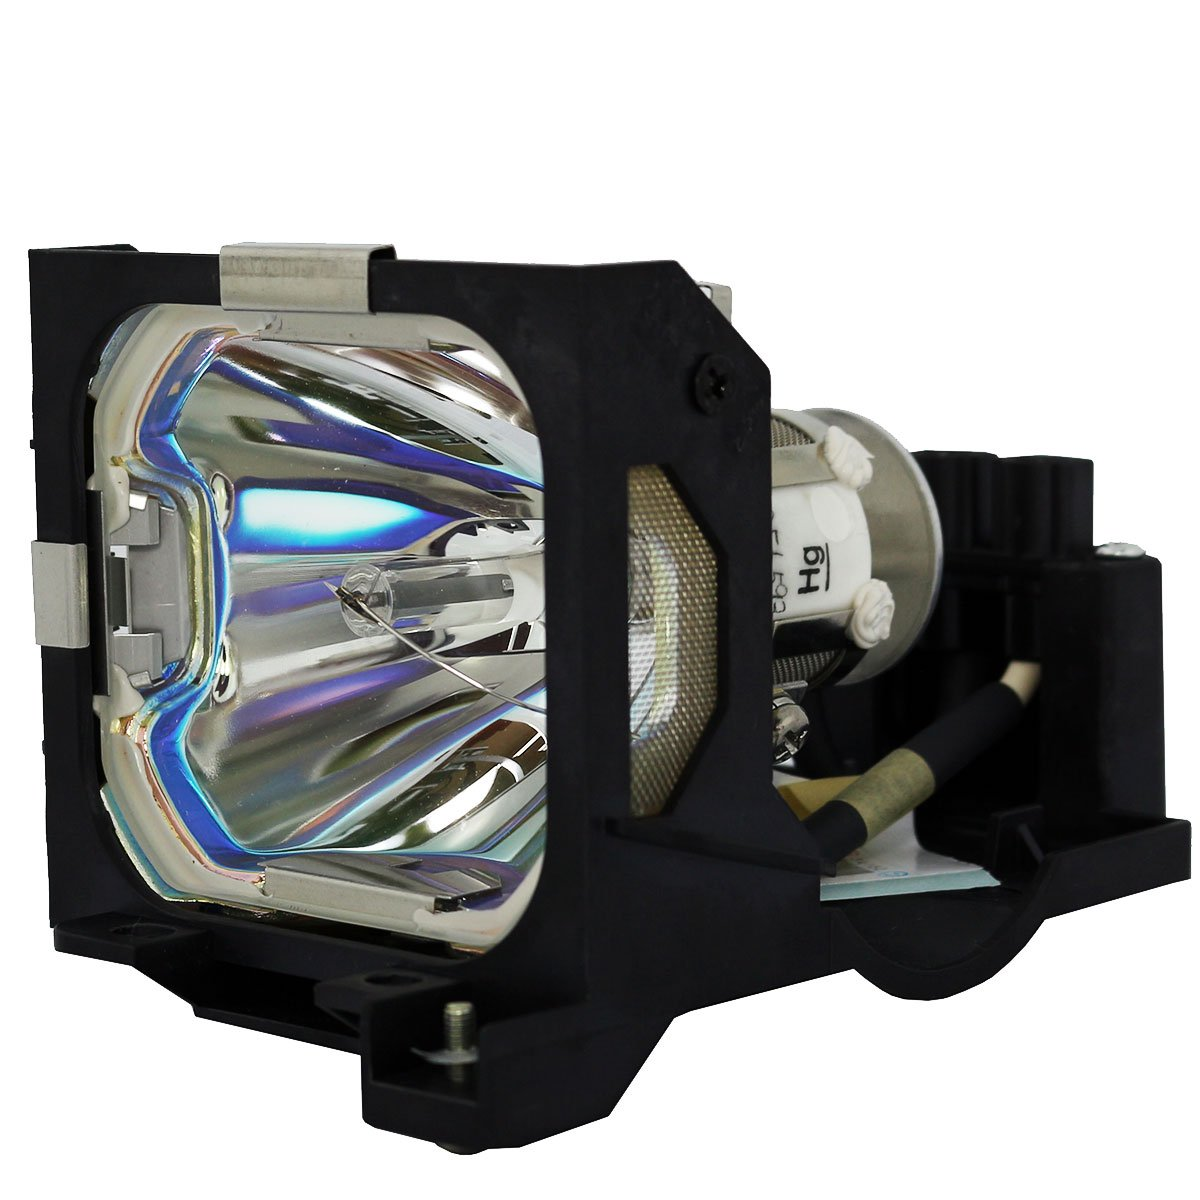 Lutema OEM 交換用ランプ ハウジング/電球付き 三菱 VLT-XL30LP用 Platinum (Brighter/Durable) Platinum (Brighter/Durable) Lamp with Housing B07KTK9Q88